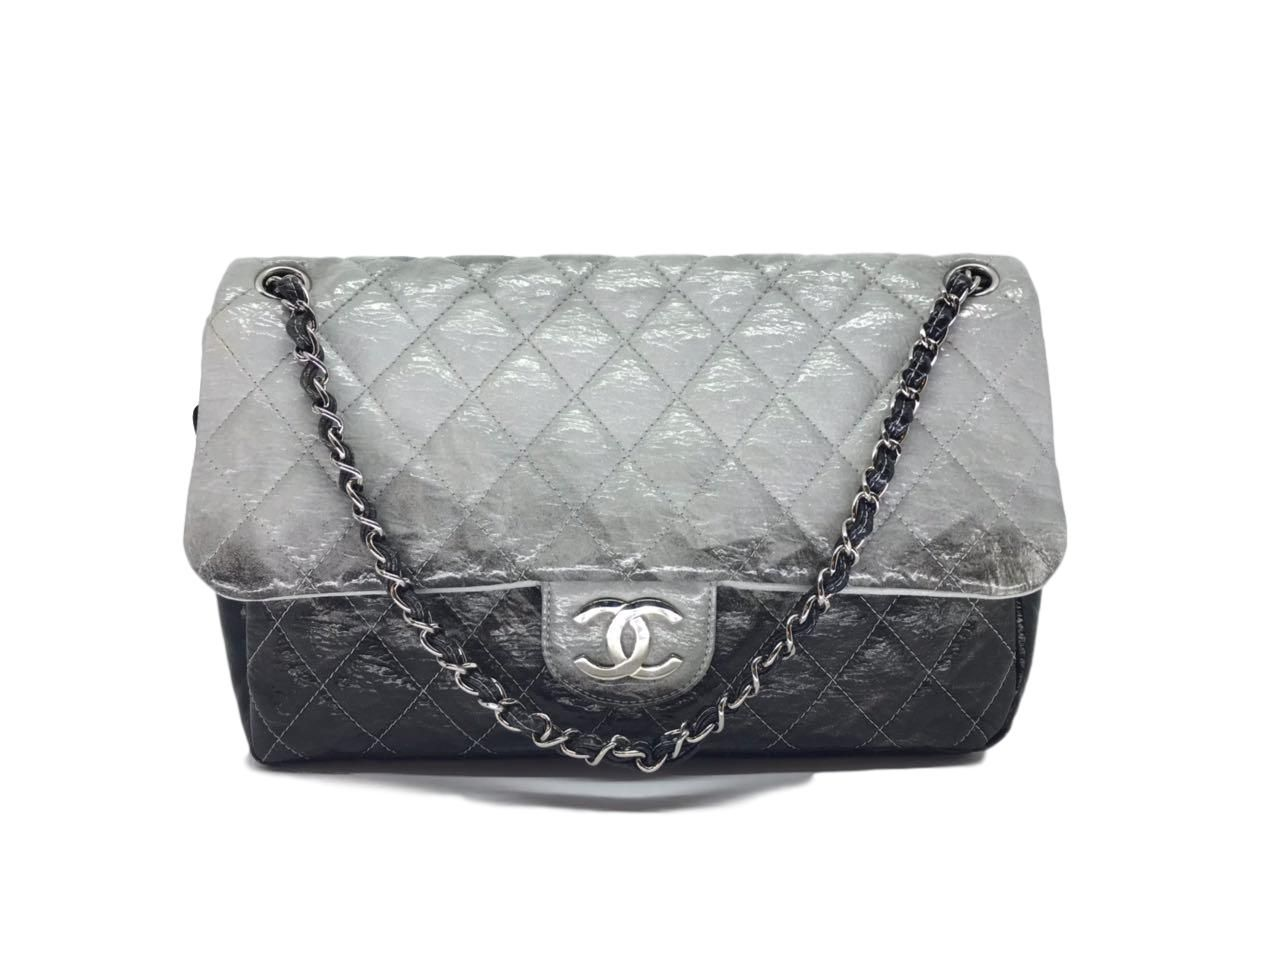 Bolsa Chanel  flap Bicolor